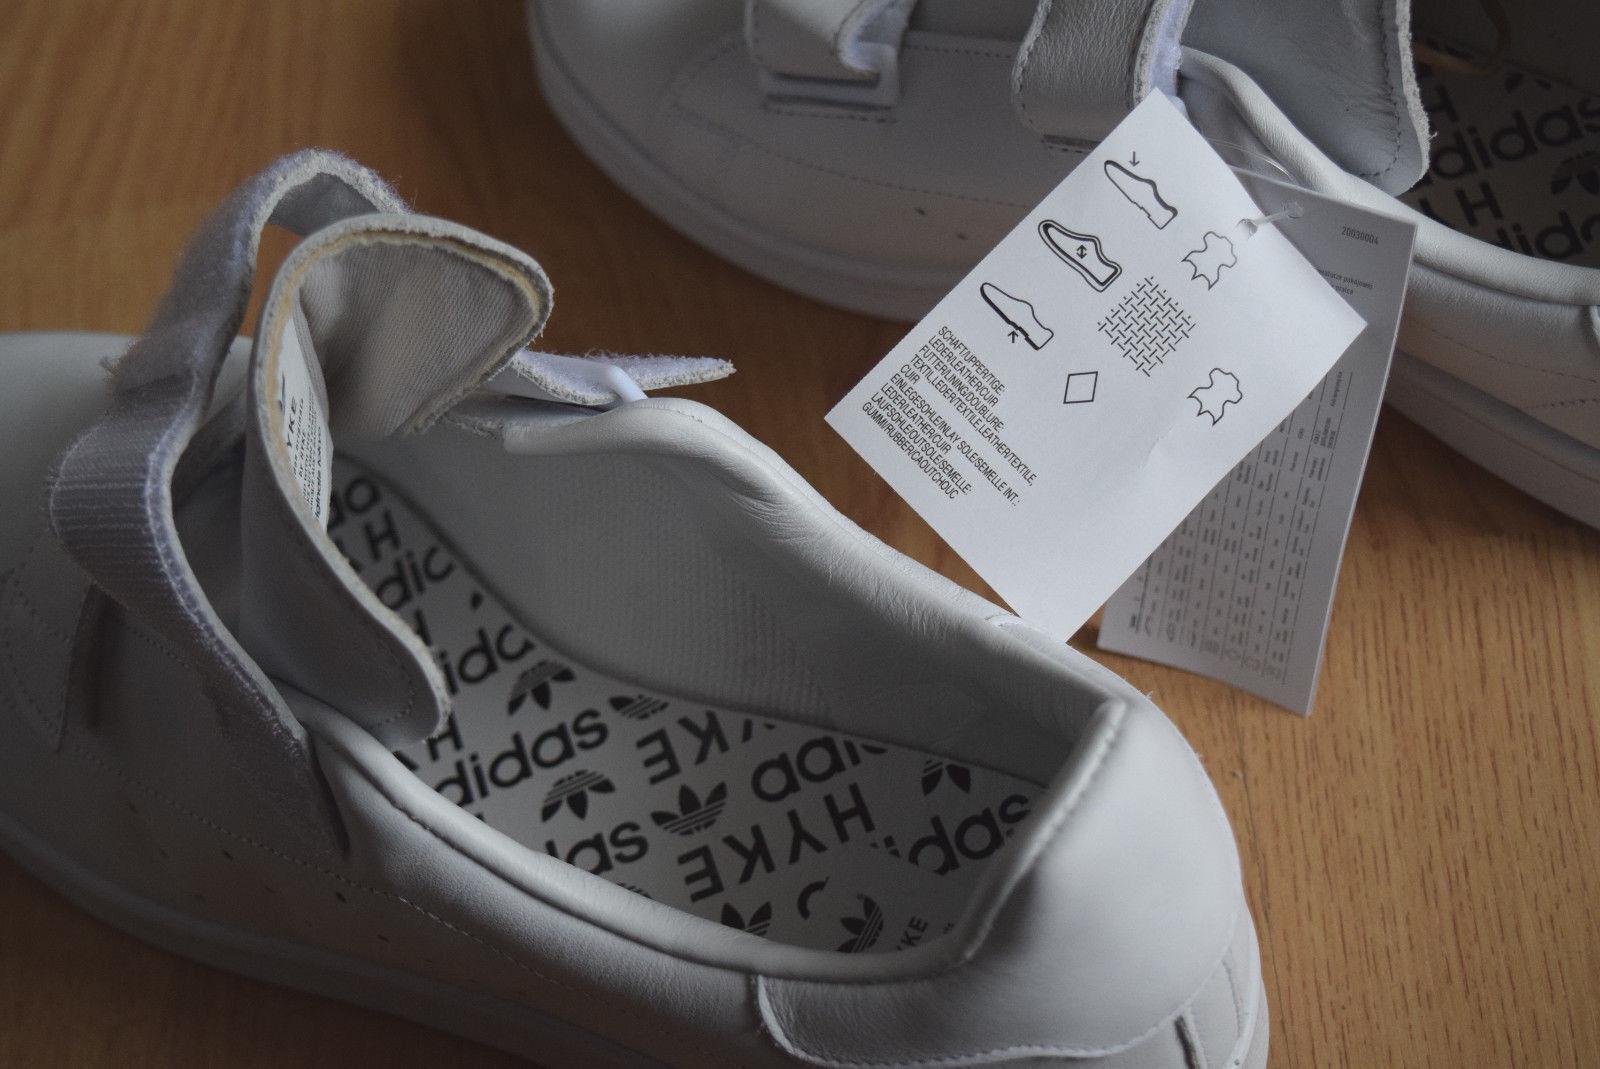 Adidas aoh-005 Hyke Hyke Hyke 40,5 41 44 46 47 s79344 RÁPIDO Stan Smith Superestrella 1ca19a